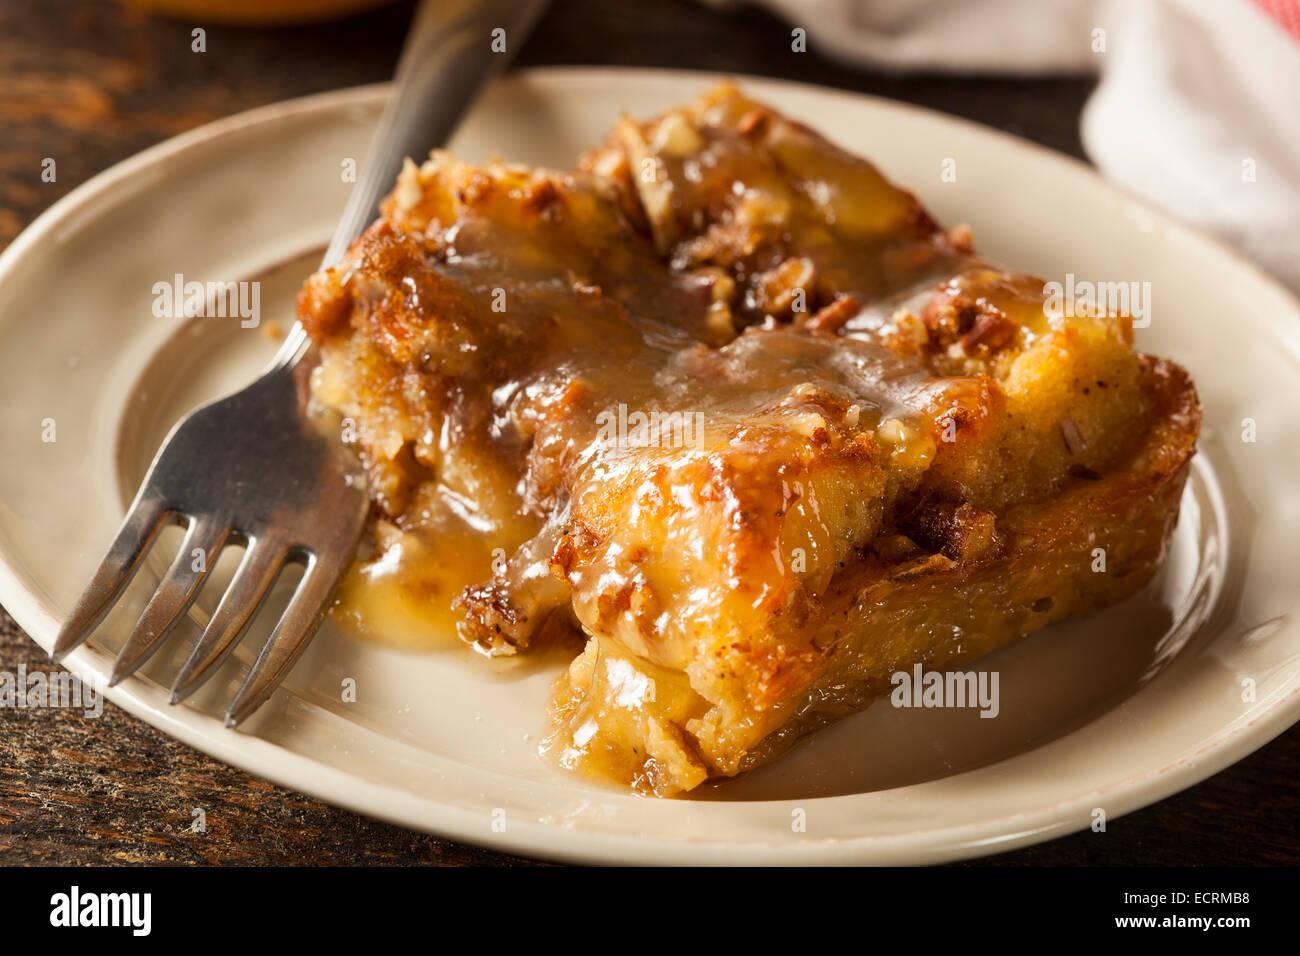 Budín de pan casero dulce postre con salsa de brandy Imagen De Stock